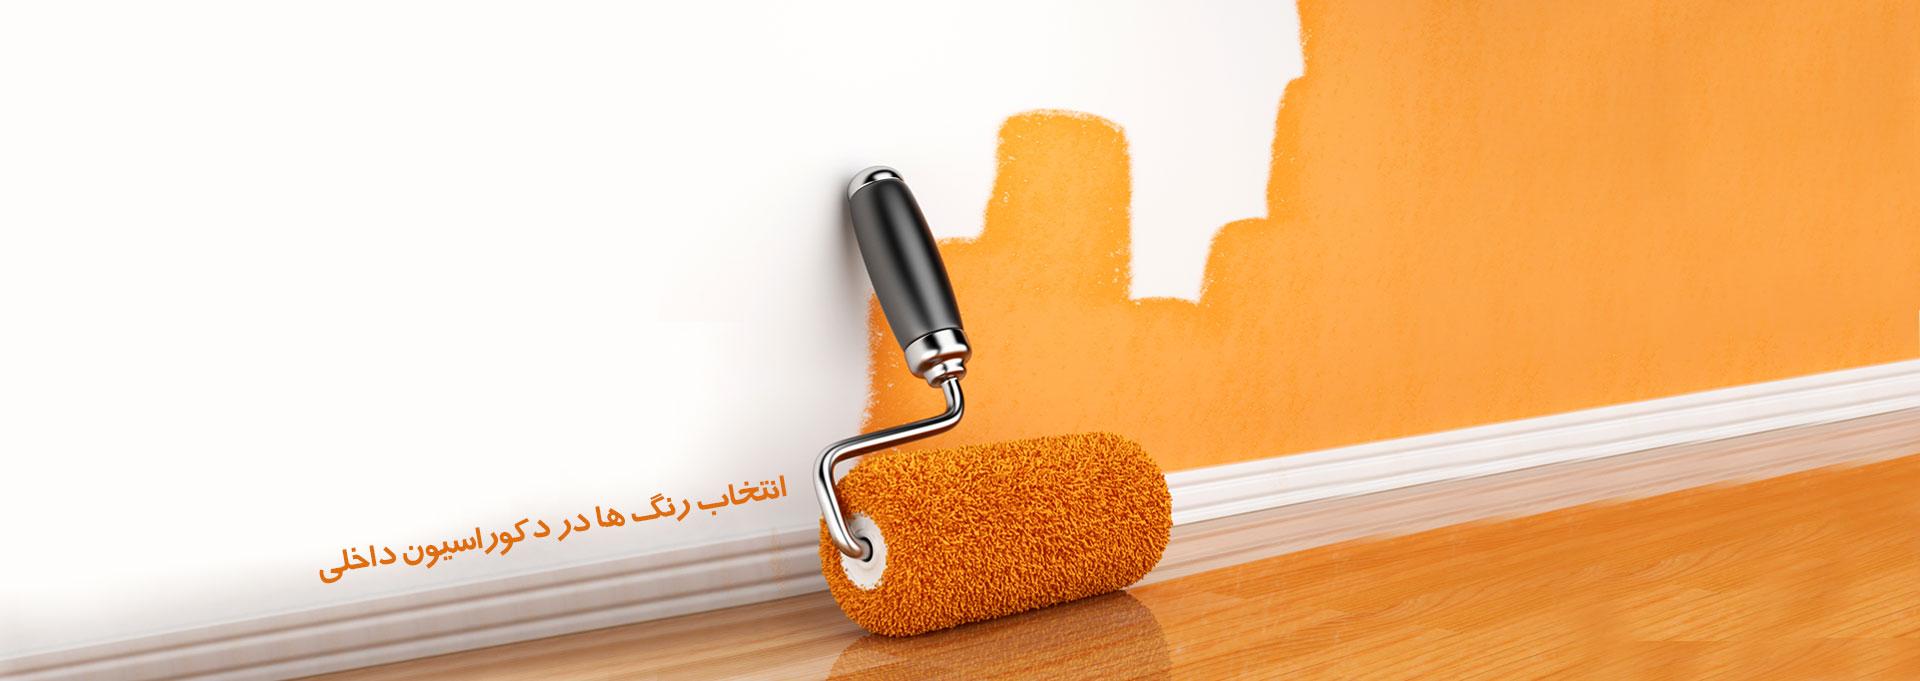 home painting1 - انتخاب رنگ ها در دکوراسیون داخلی